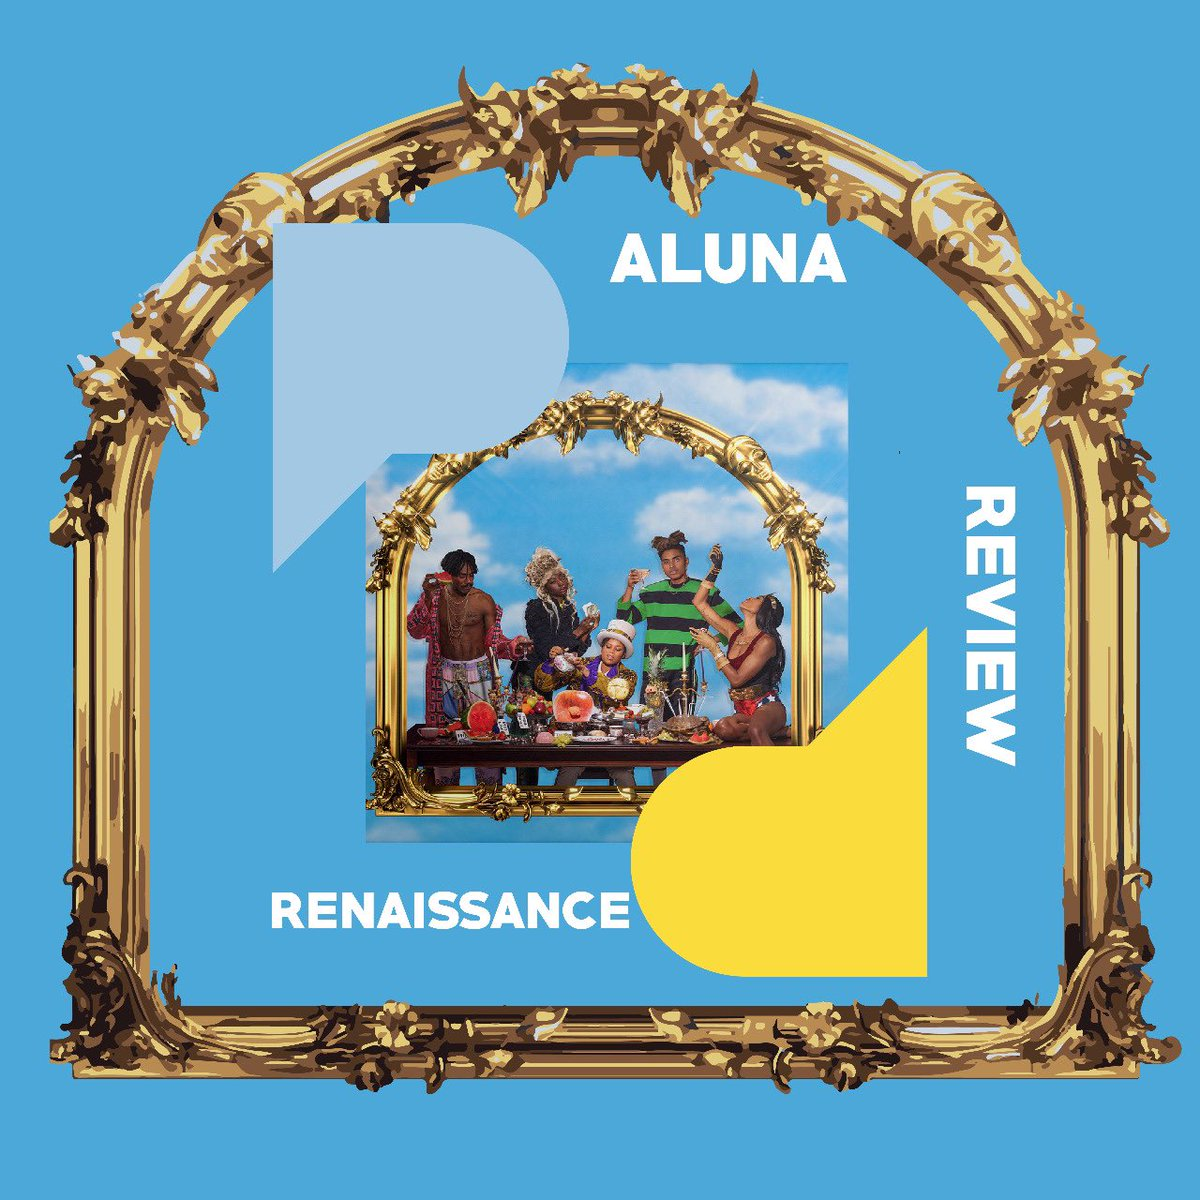 #Review Aluna: RENAISSANCE. MB IQ: 7.8 #Hot #New #Music #Art #Trend #Pop #Dance #Funk #Revolution #Art  https://t.co/yjqFP4ACZI https://t.co/28ld1zdLaR